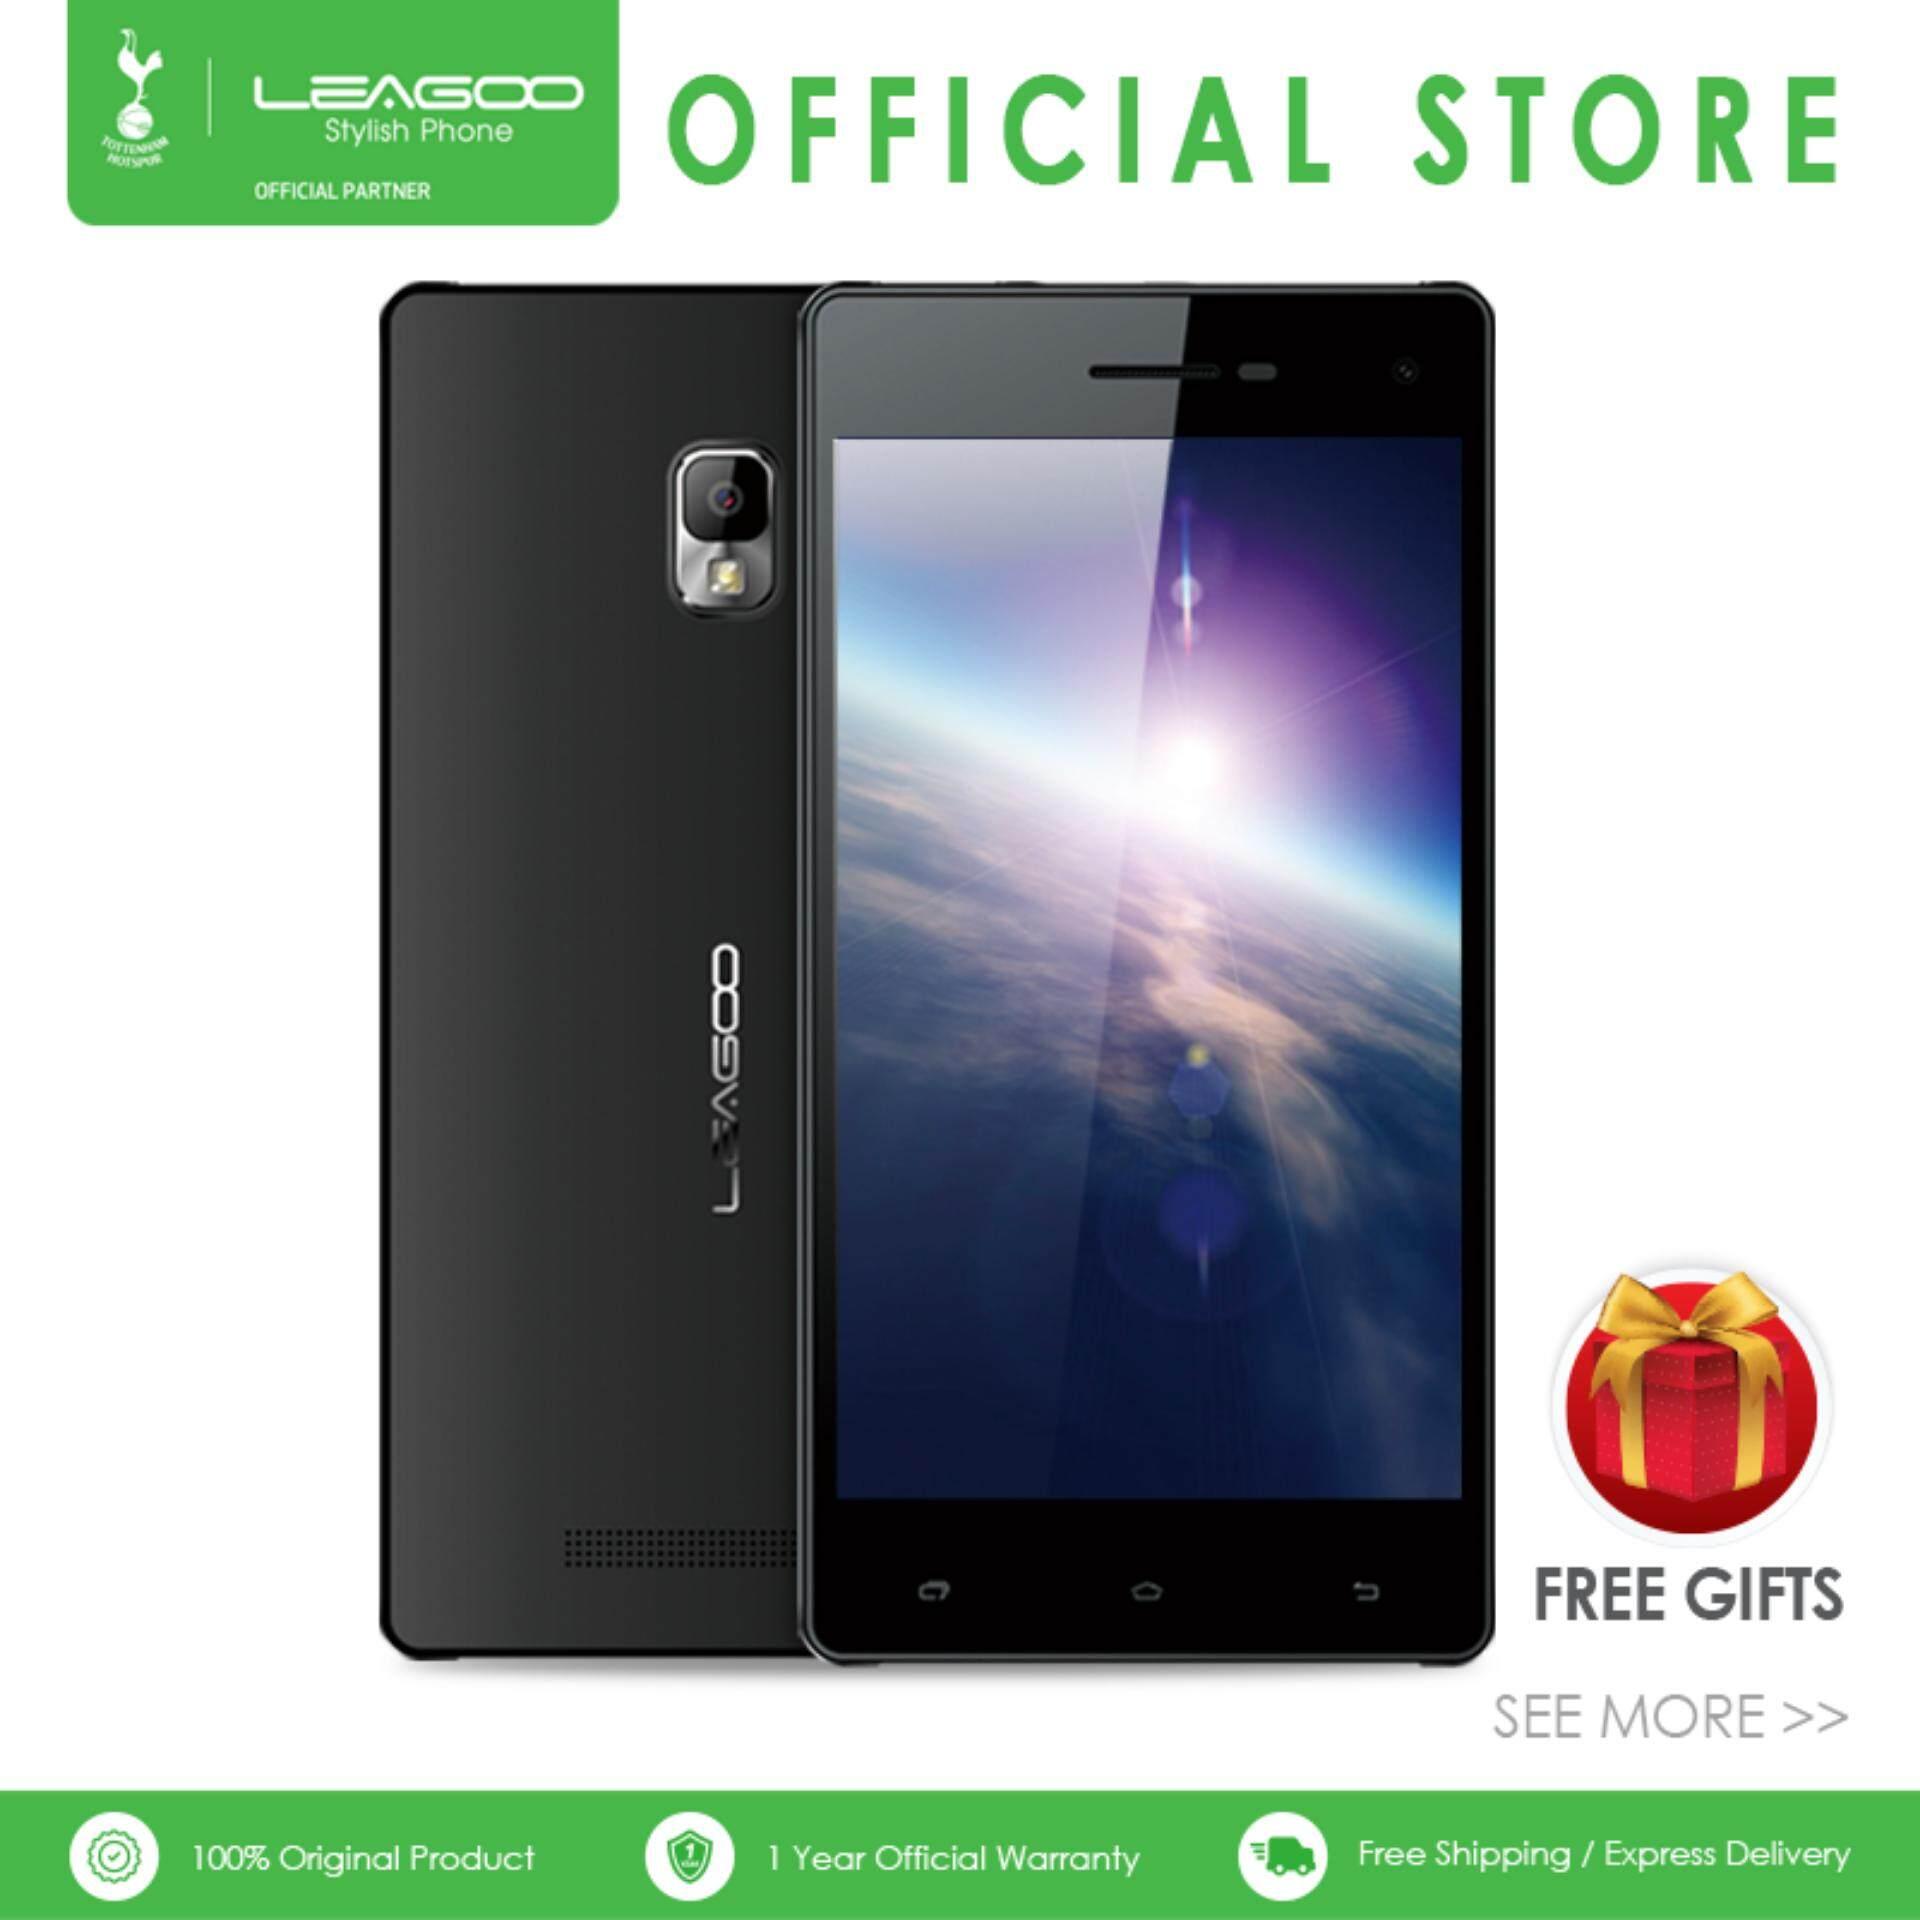 LEAGOO Lead 2s 8GB (White)